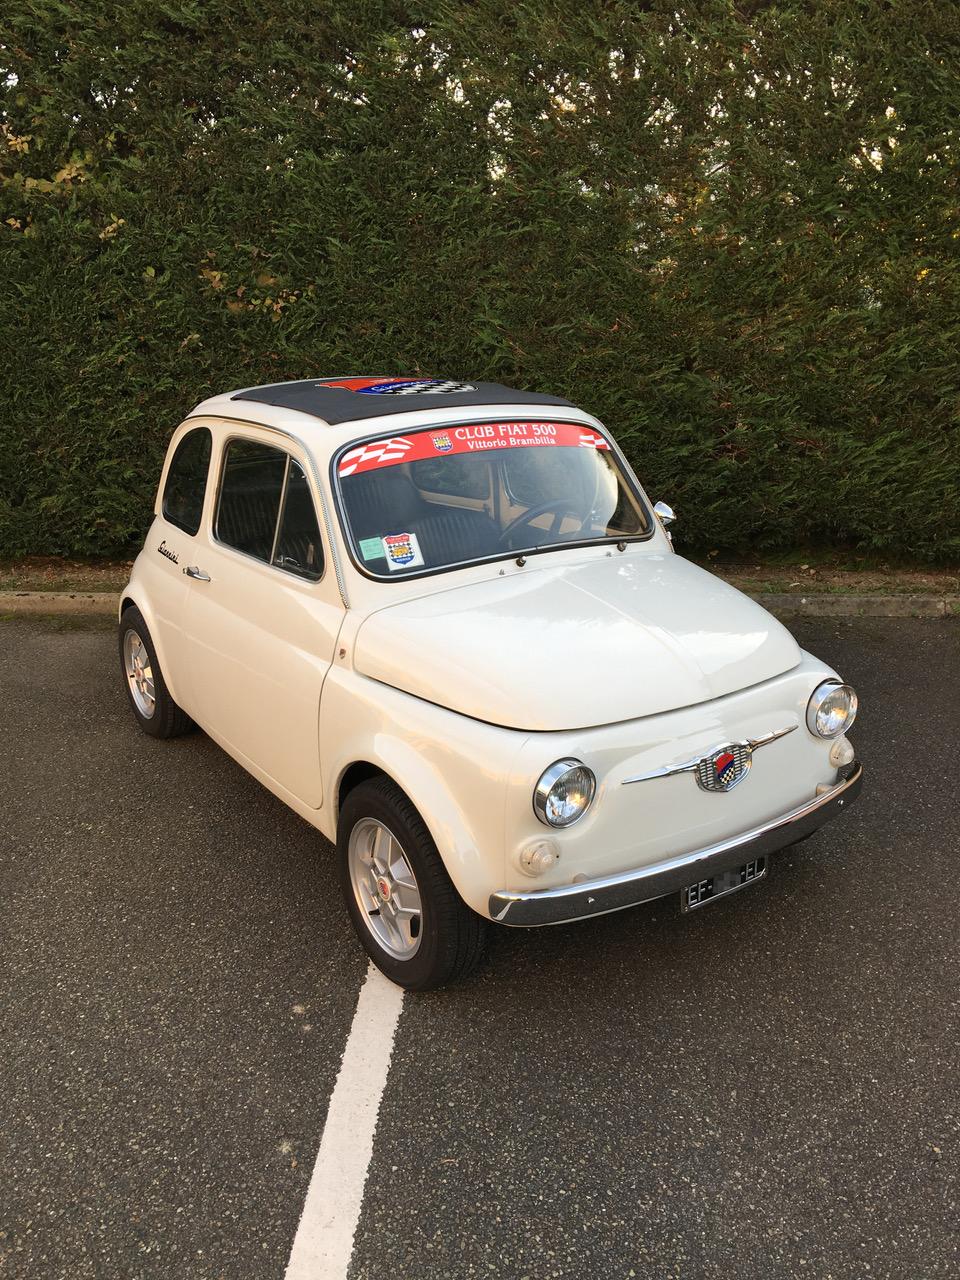 Vente 2 Fiat 500 Img_3212